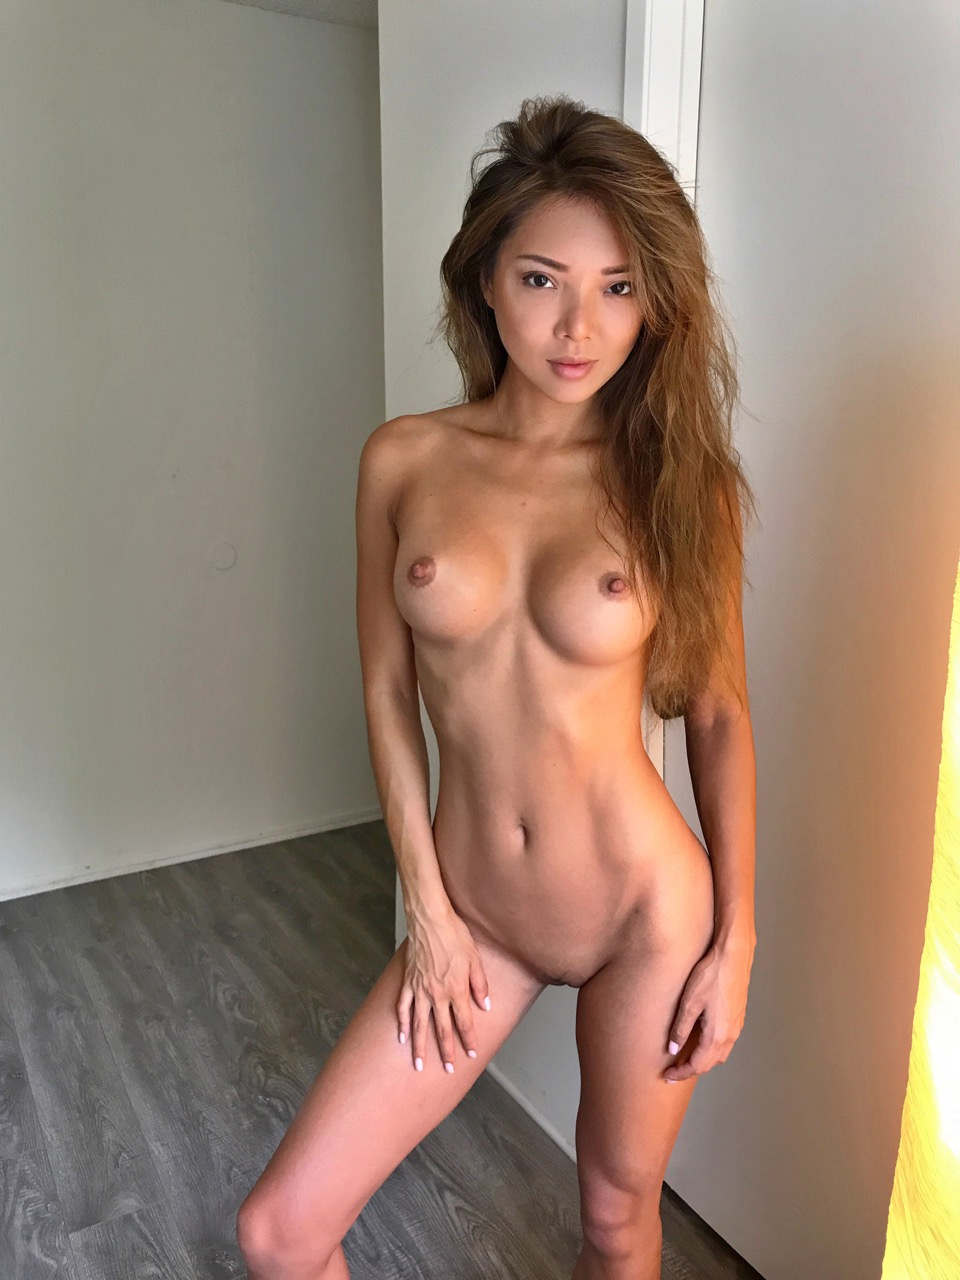 Porno Ayumi Anime naked (16 photos), Pussy, Hot, Selfie, swimsuit 2006